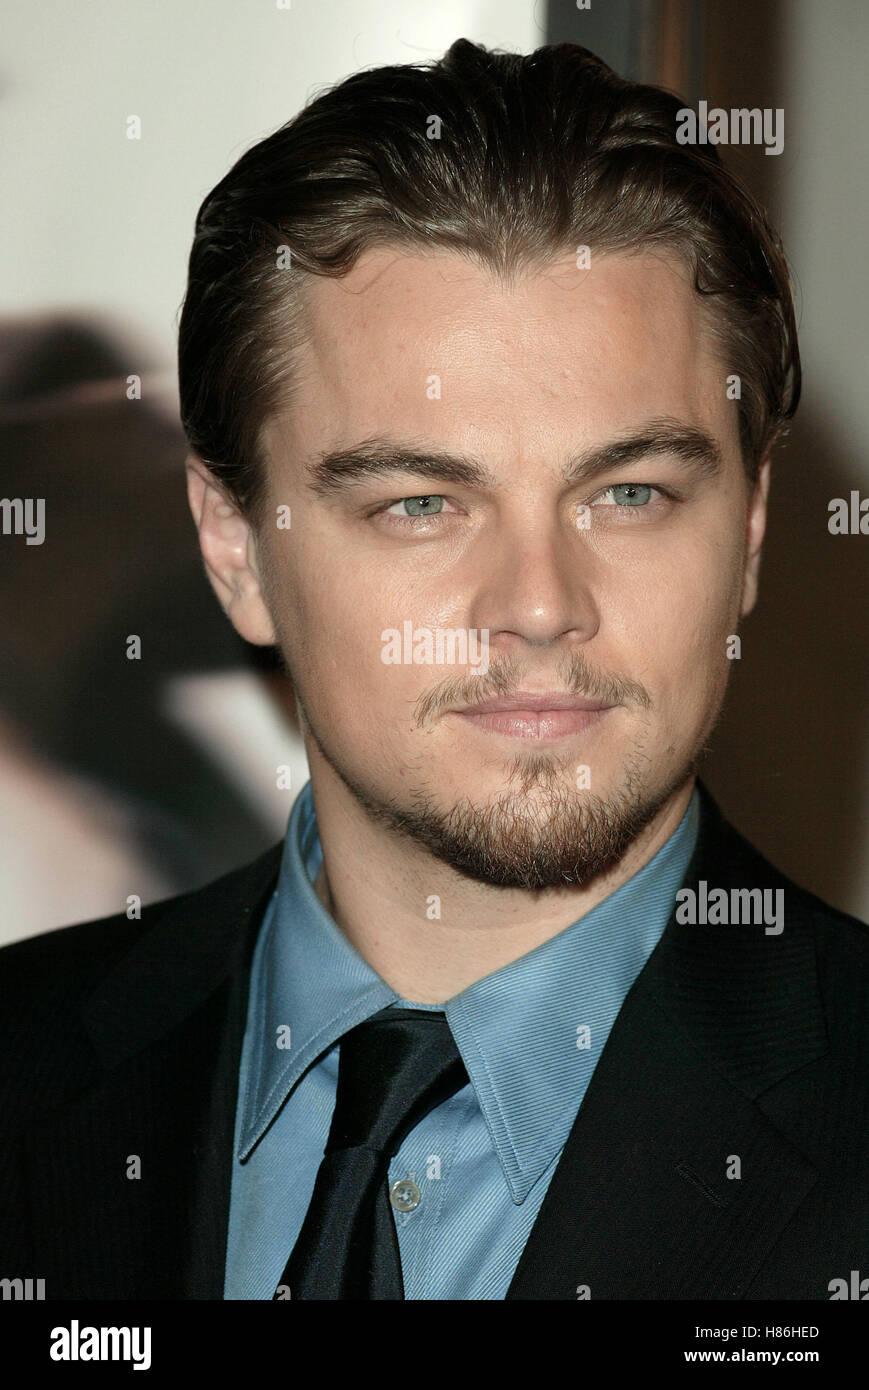 Leonardo Dicaprio Catch Me If You Can La Prem Westwood Los Angeles